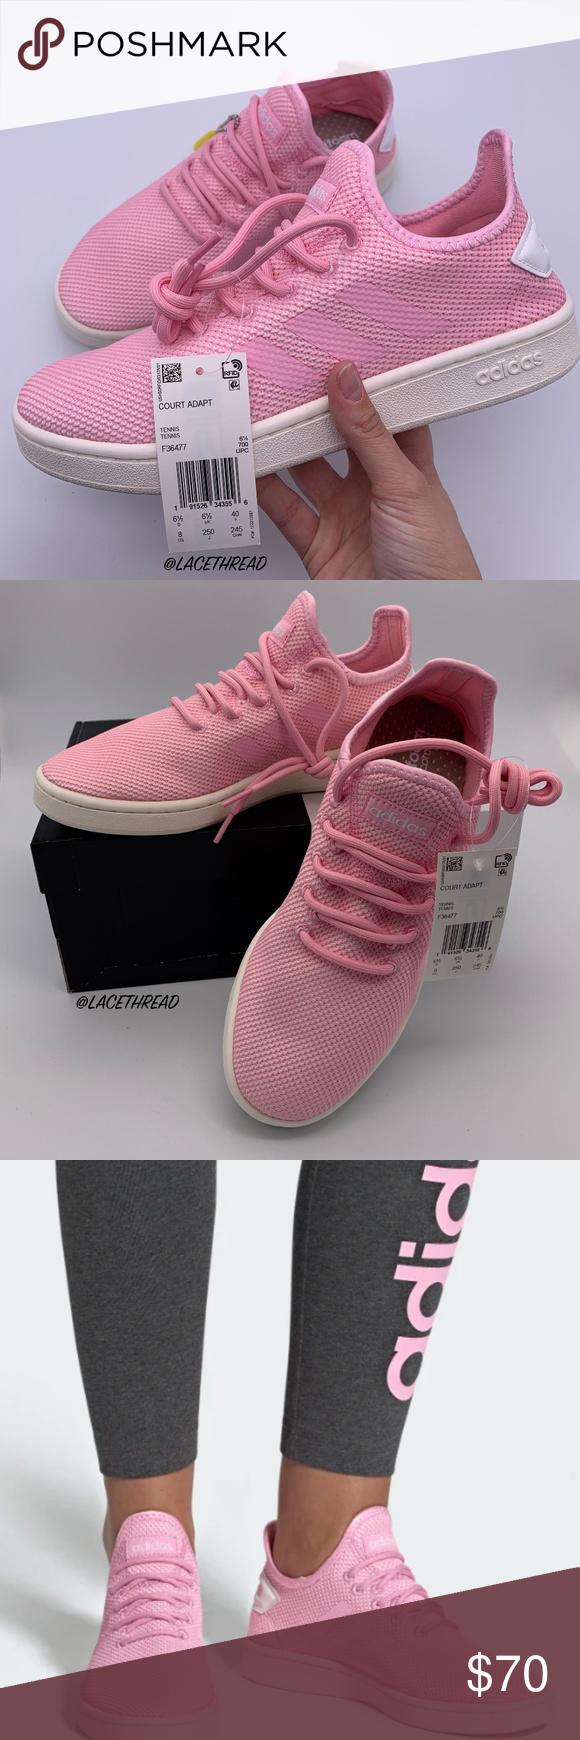 ADIDAS - WOMEN'S ESSENTIALS COURT ADAPT SNEAKERS | Adidas ...